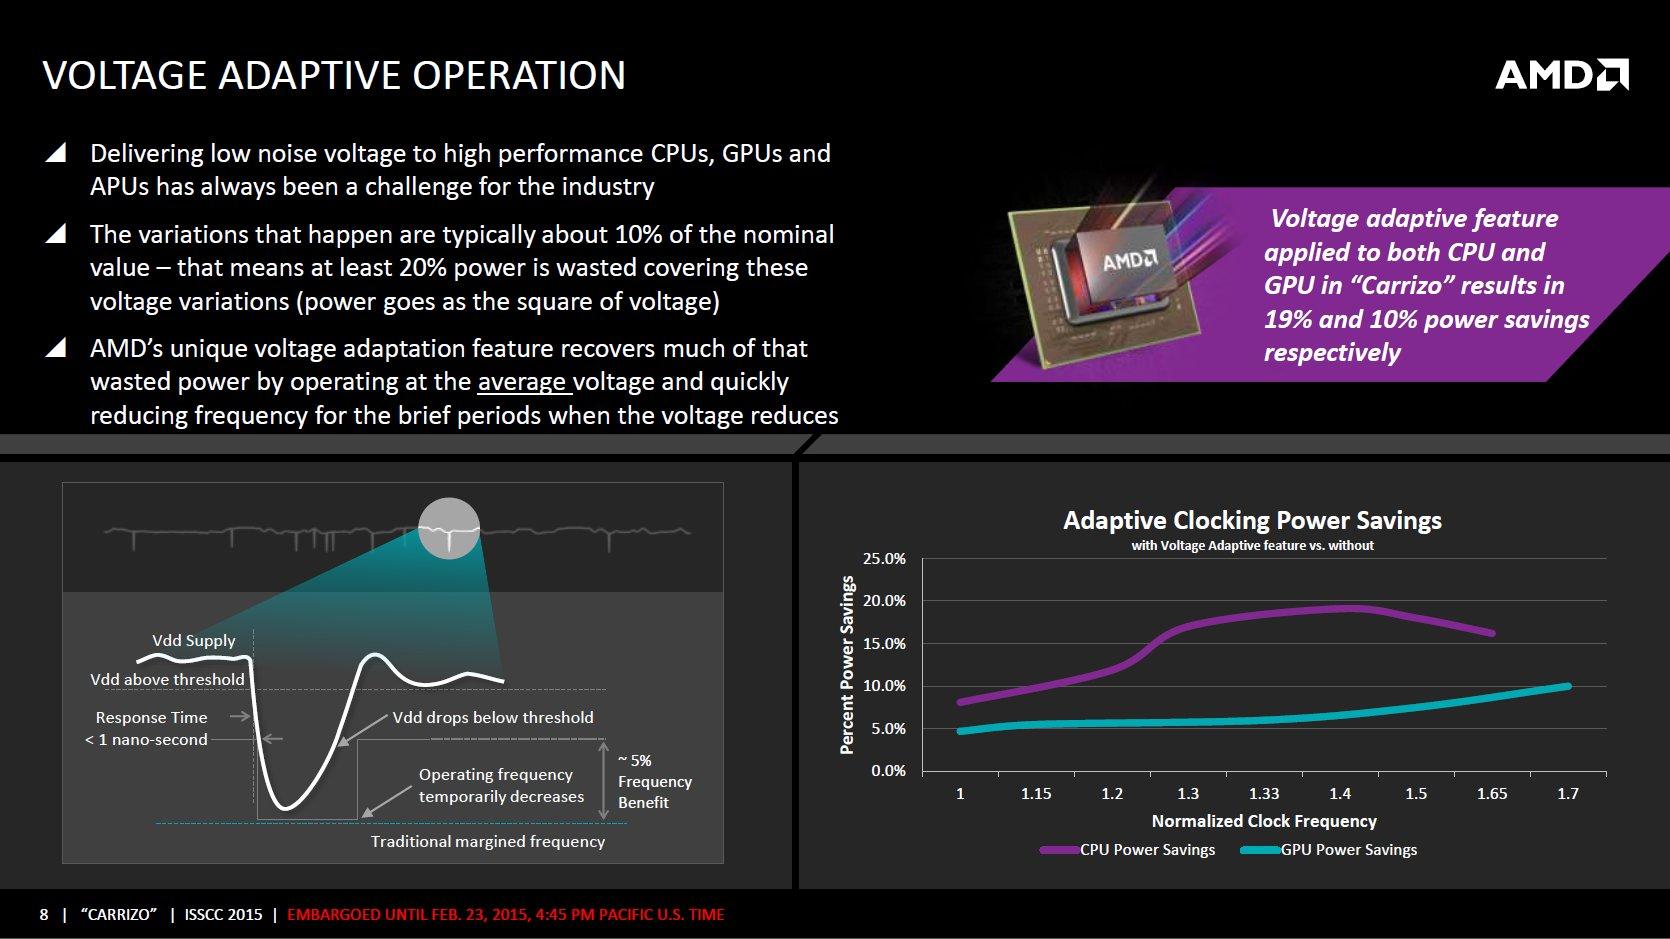 Voltage Adaptive Operation